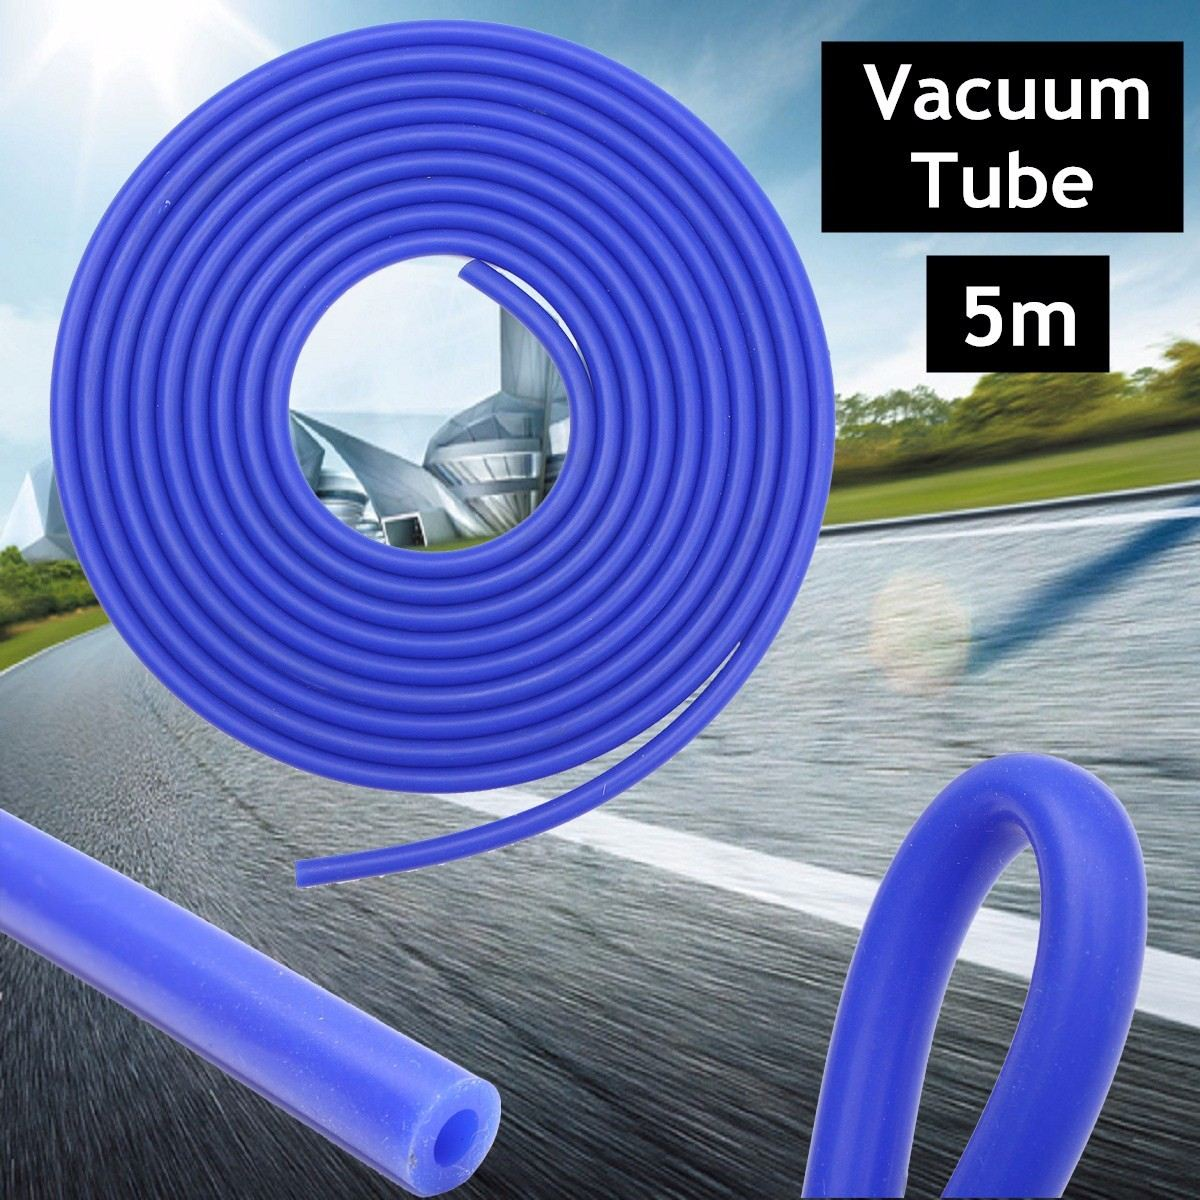 Auto Car Vacuum Silicone Hose Racing Line Pipe Tube Car-styling Blue 5M 4mm Silicone Vacuum Tube Hose Silicone Tubing 16.4ft